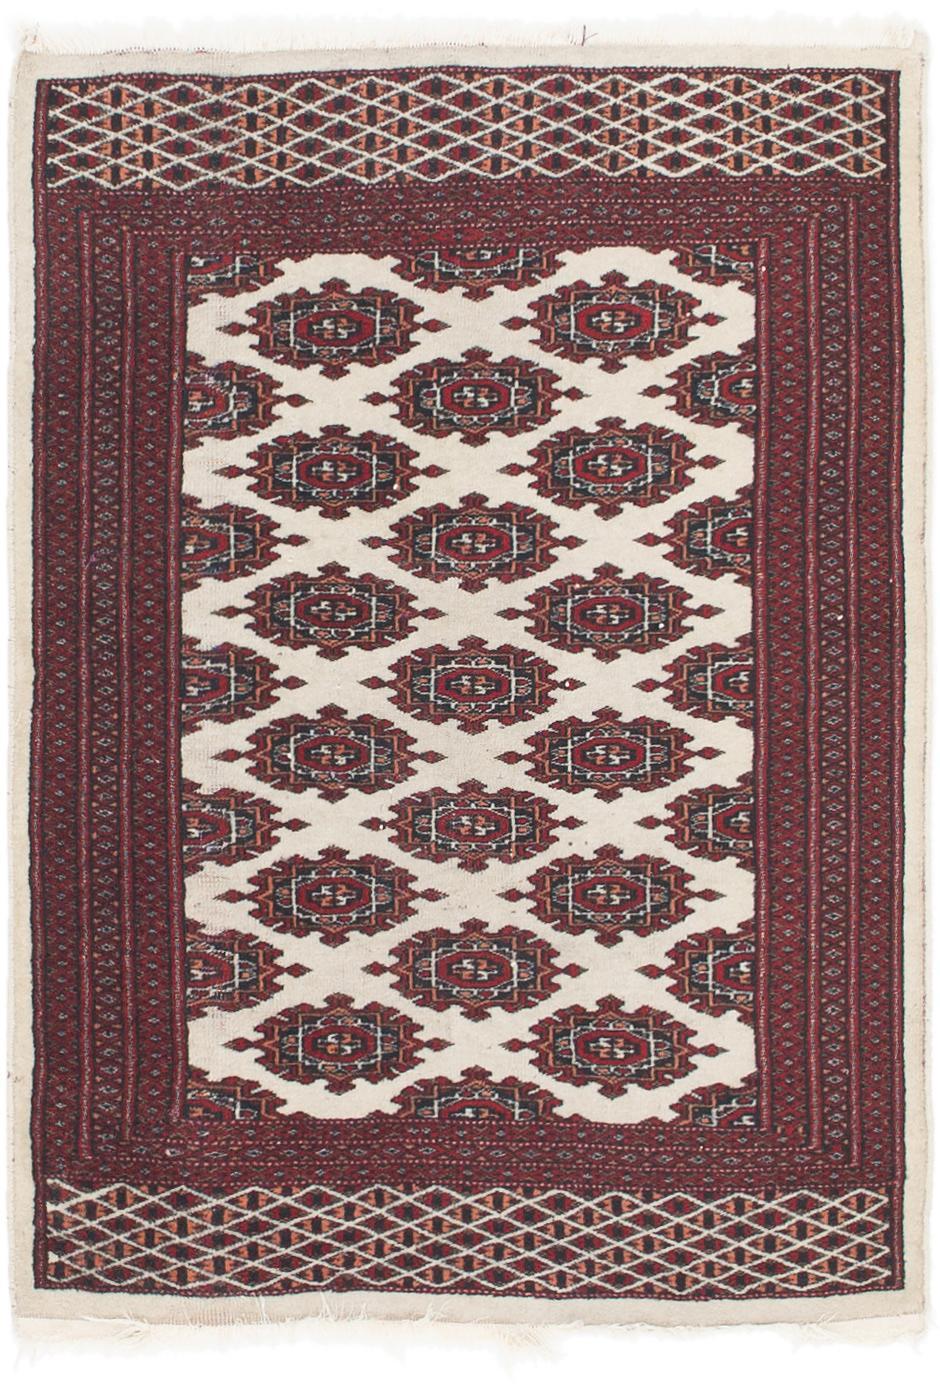 Main Unique Loom 2 8 X 3 Bokhara Oriental Rug Photo